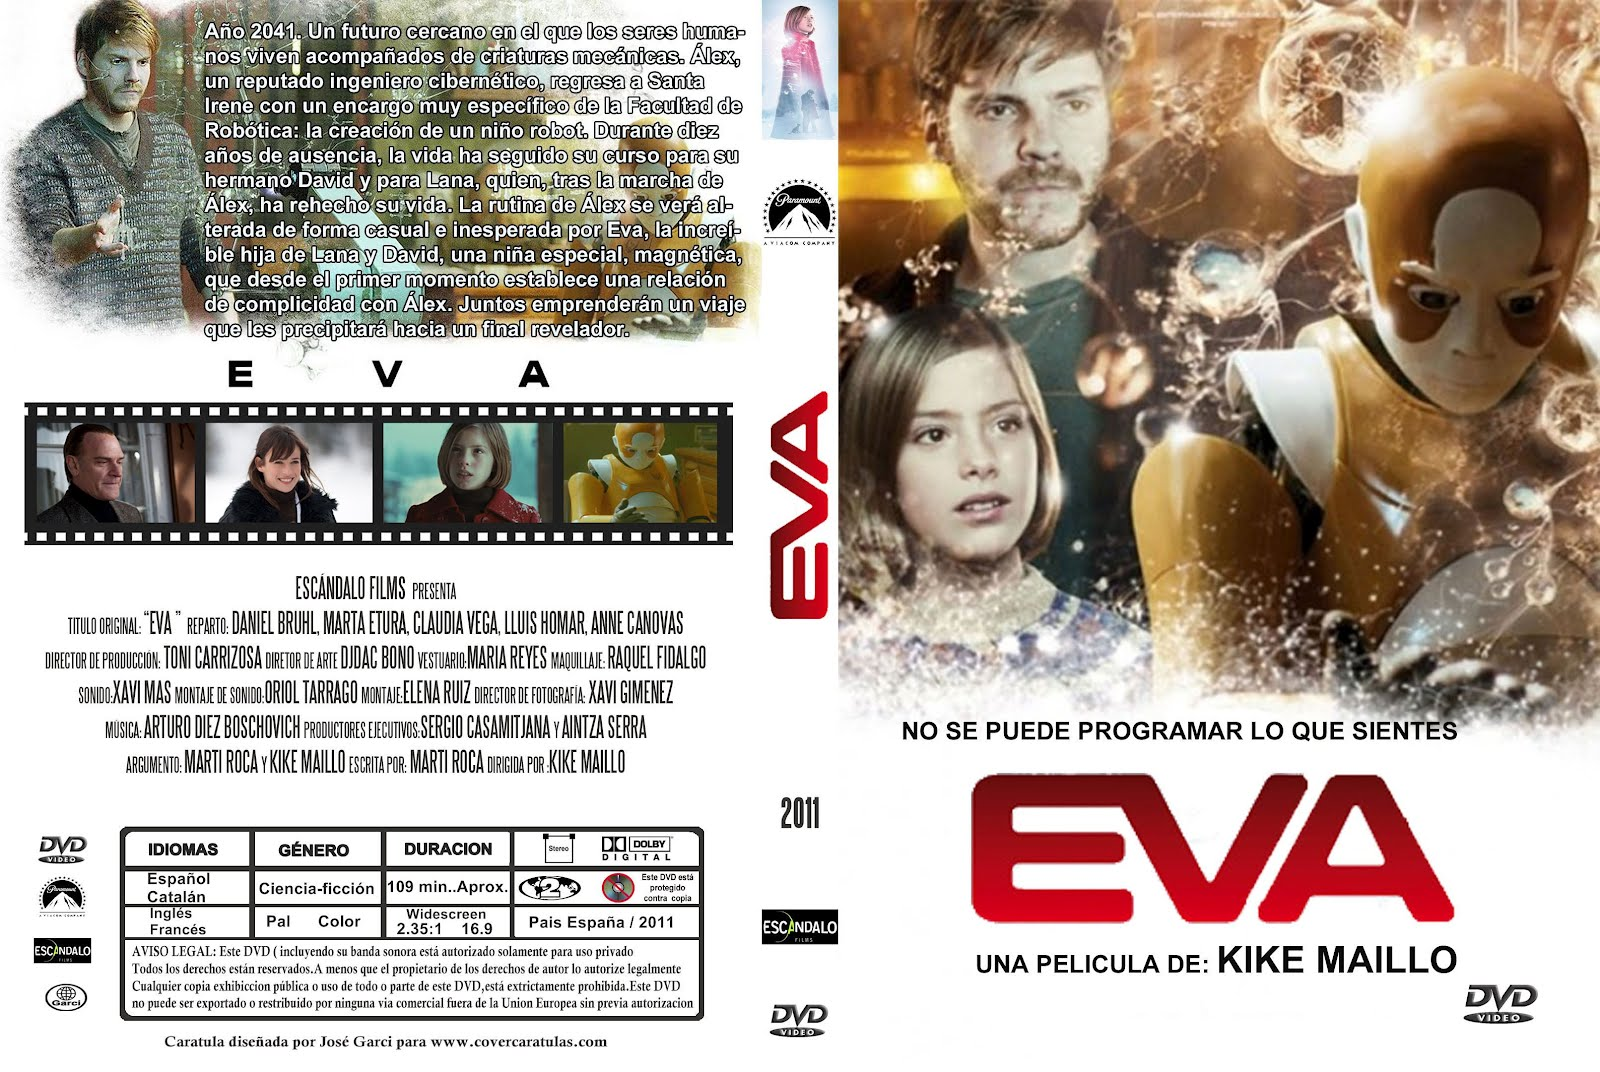 http://2.bp.blogspot.com/-8dPipxg0kcY/T65zQsDDcxI/AAAAAAAACTk/Q8IKYMV5Beg/s1600/Eva_-_2011_-_Custom_por_Josegarci_%255Bdvd%255D_80.jpg